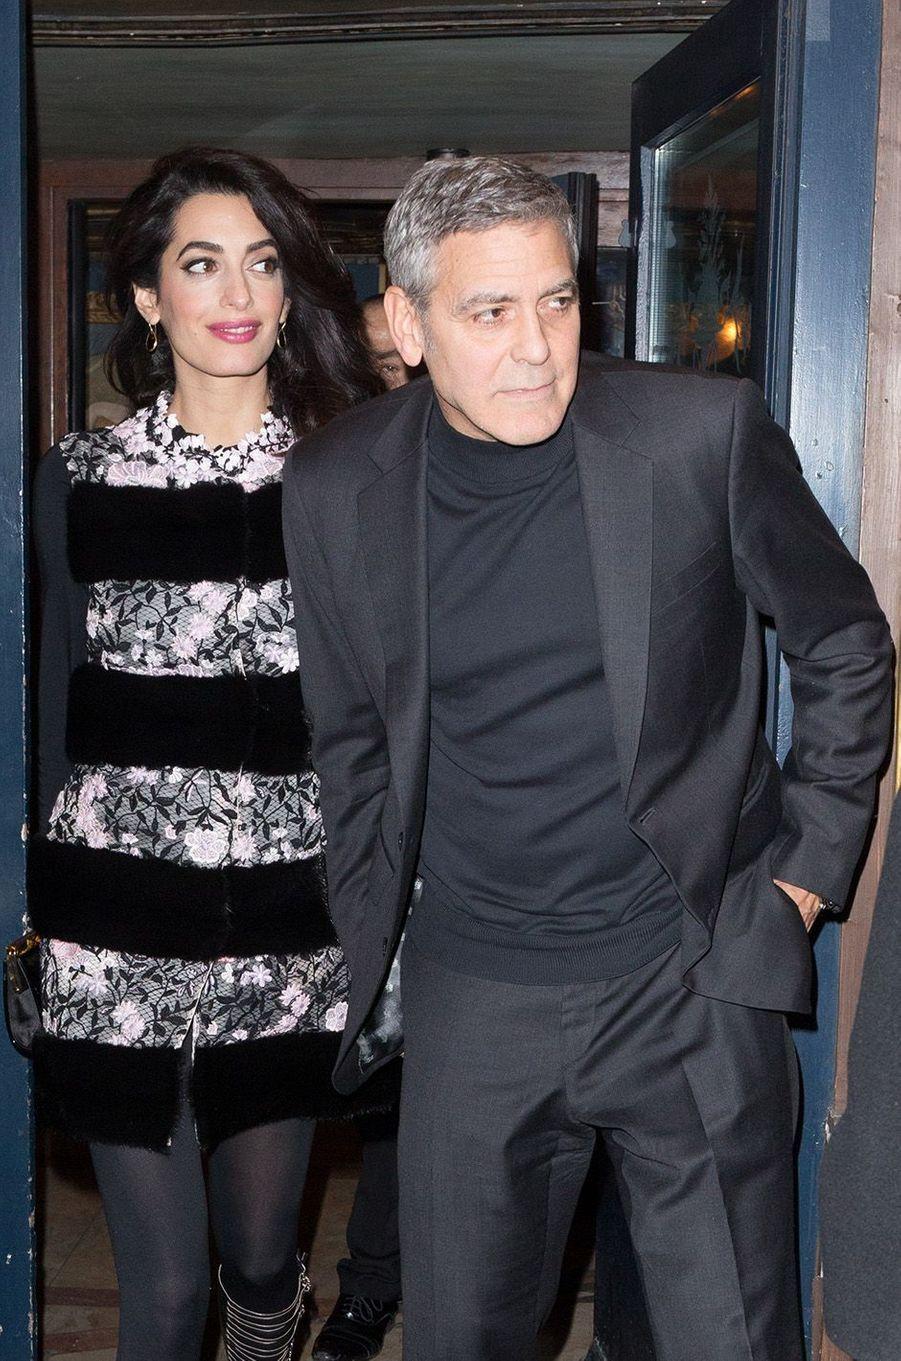 Amal Clooney dans une robe Giambattista Valli. Valeur : 9500 dollars.